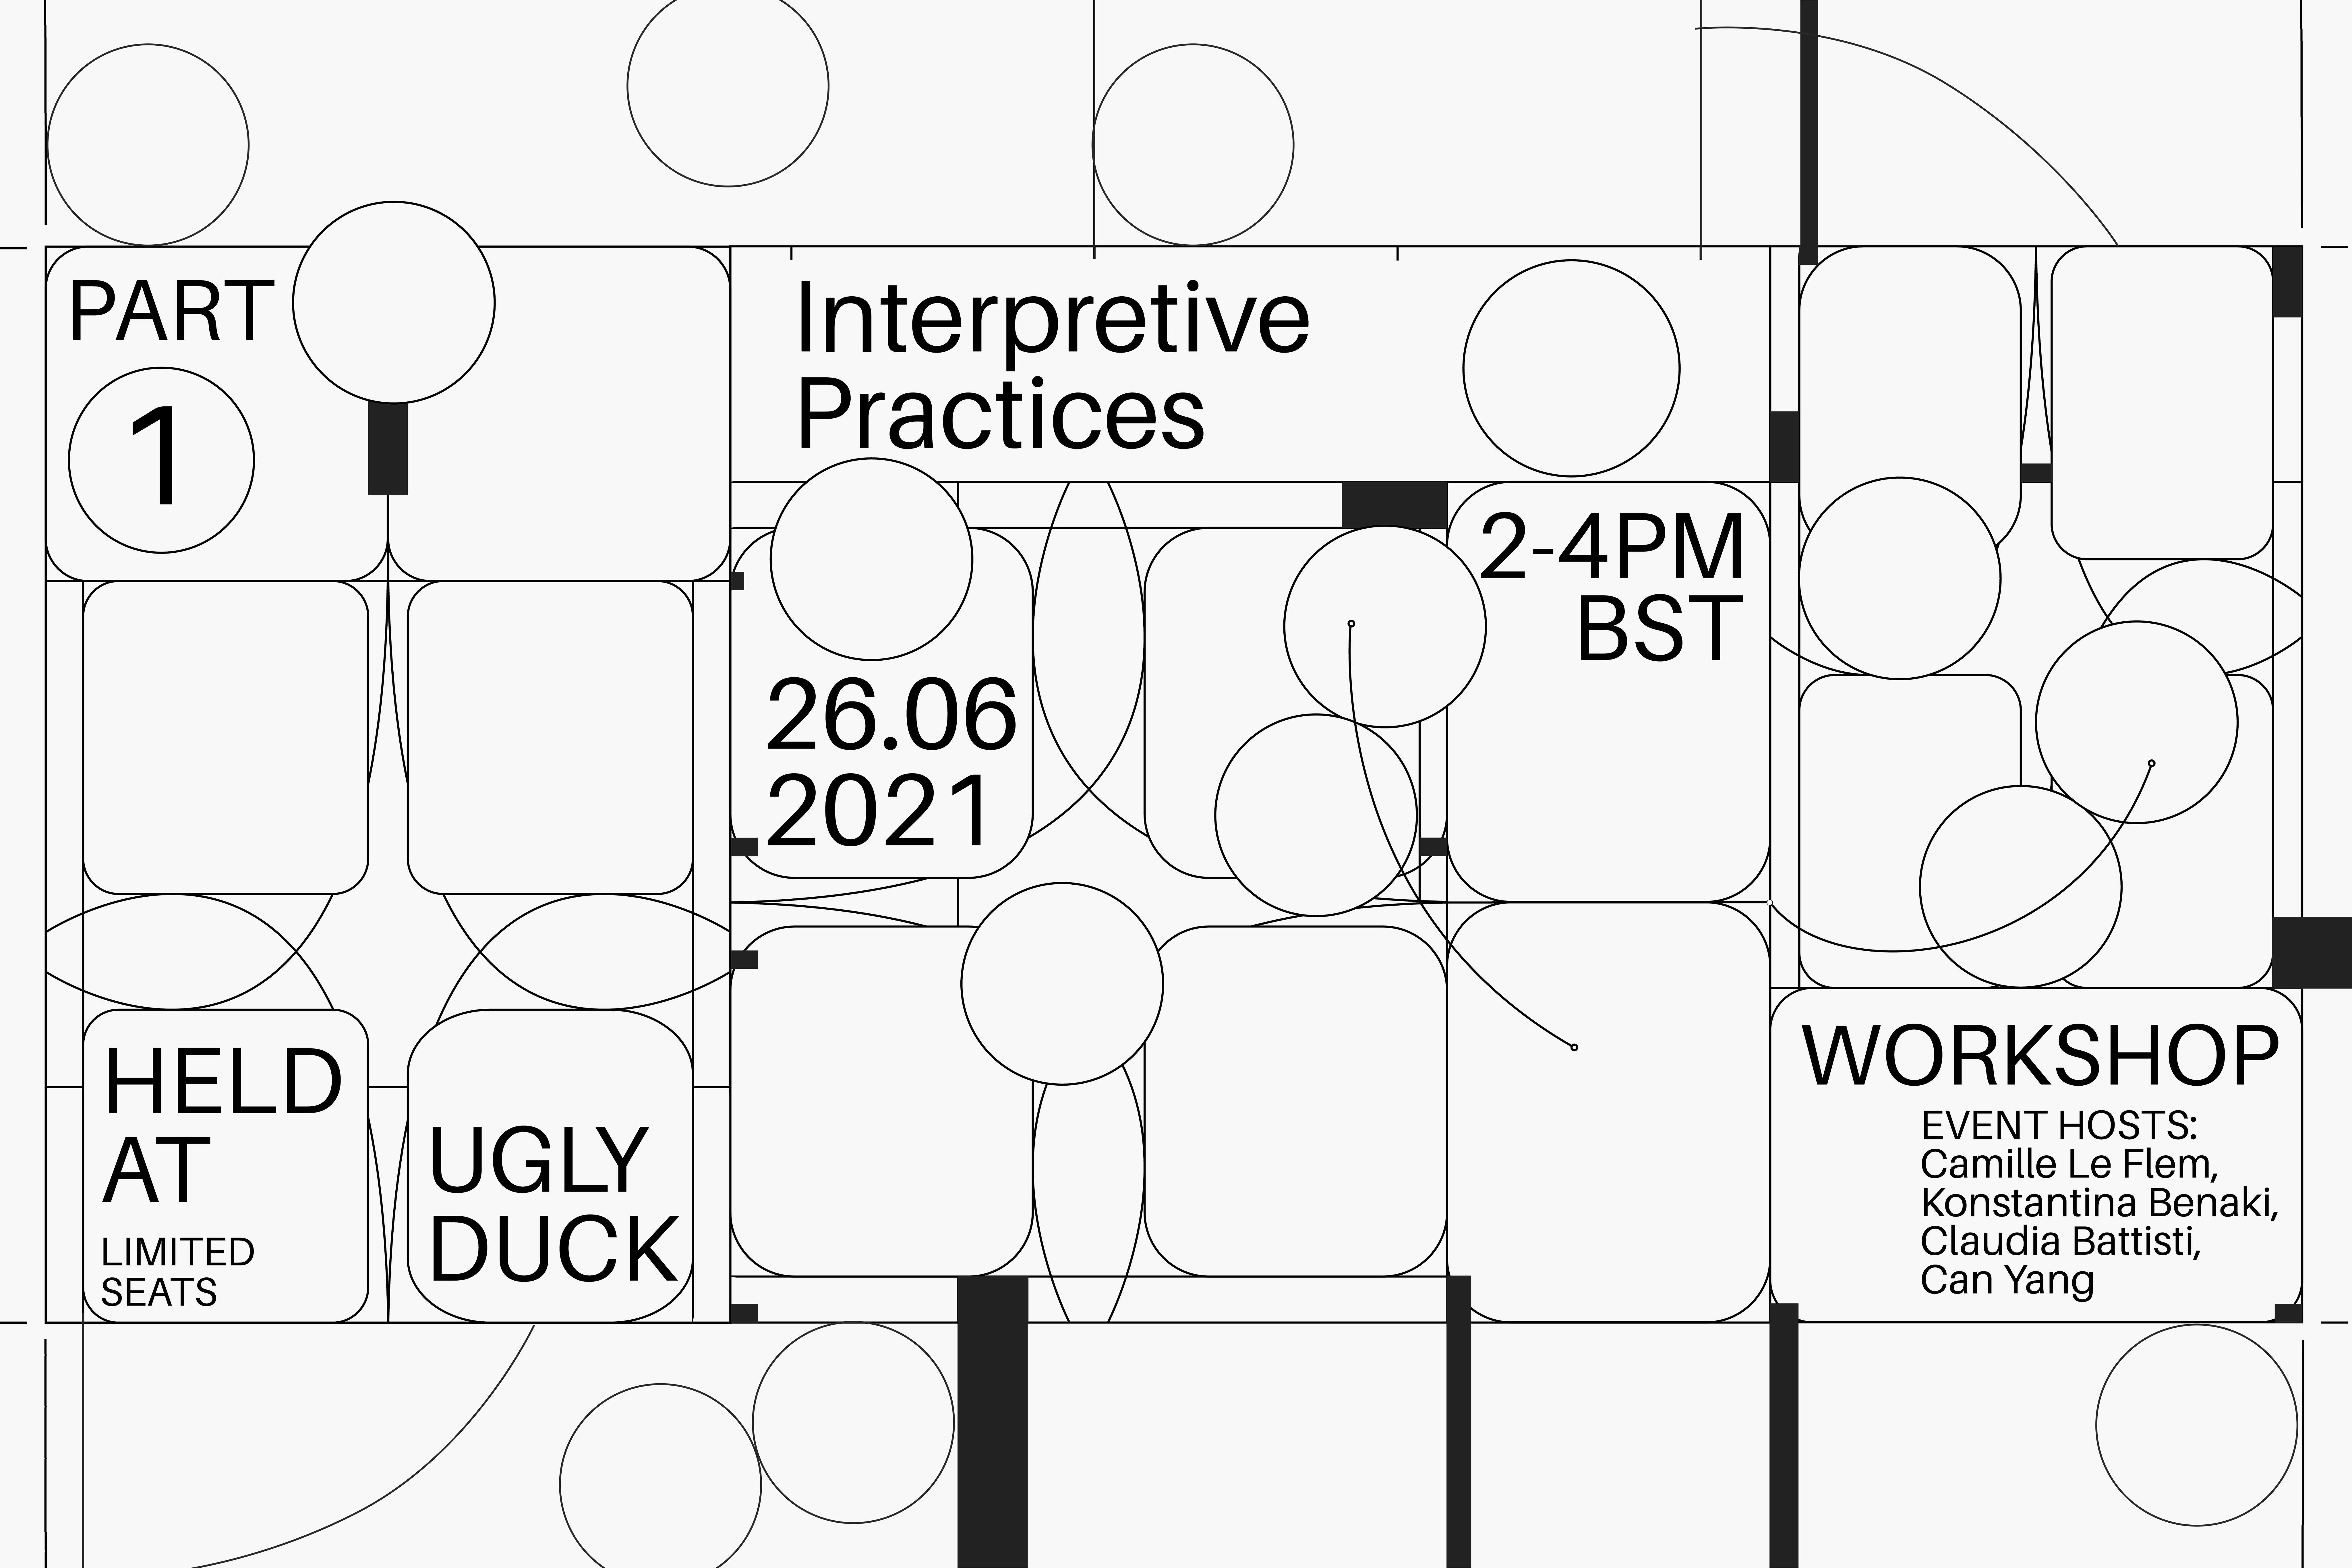 Interpretive Practices (Part 1) cover